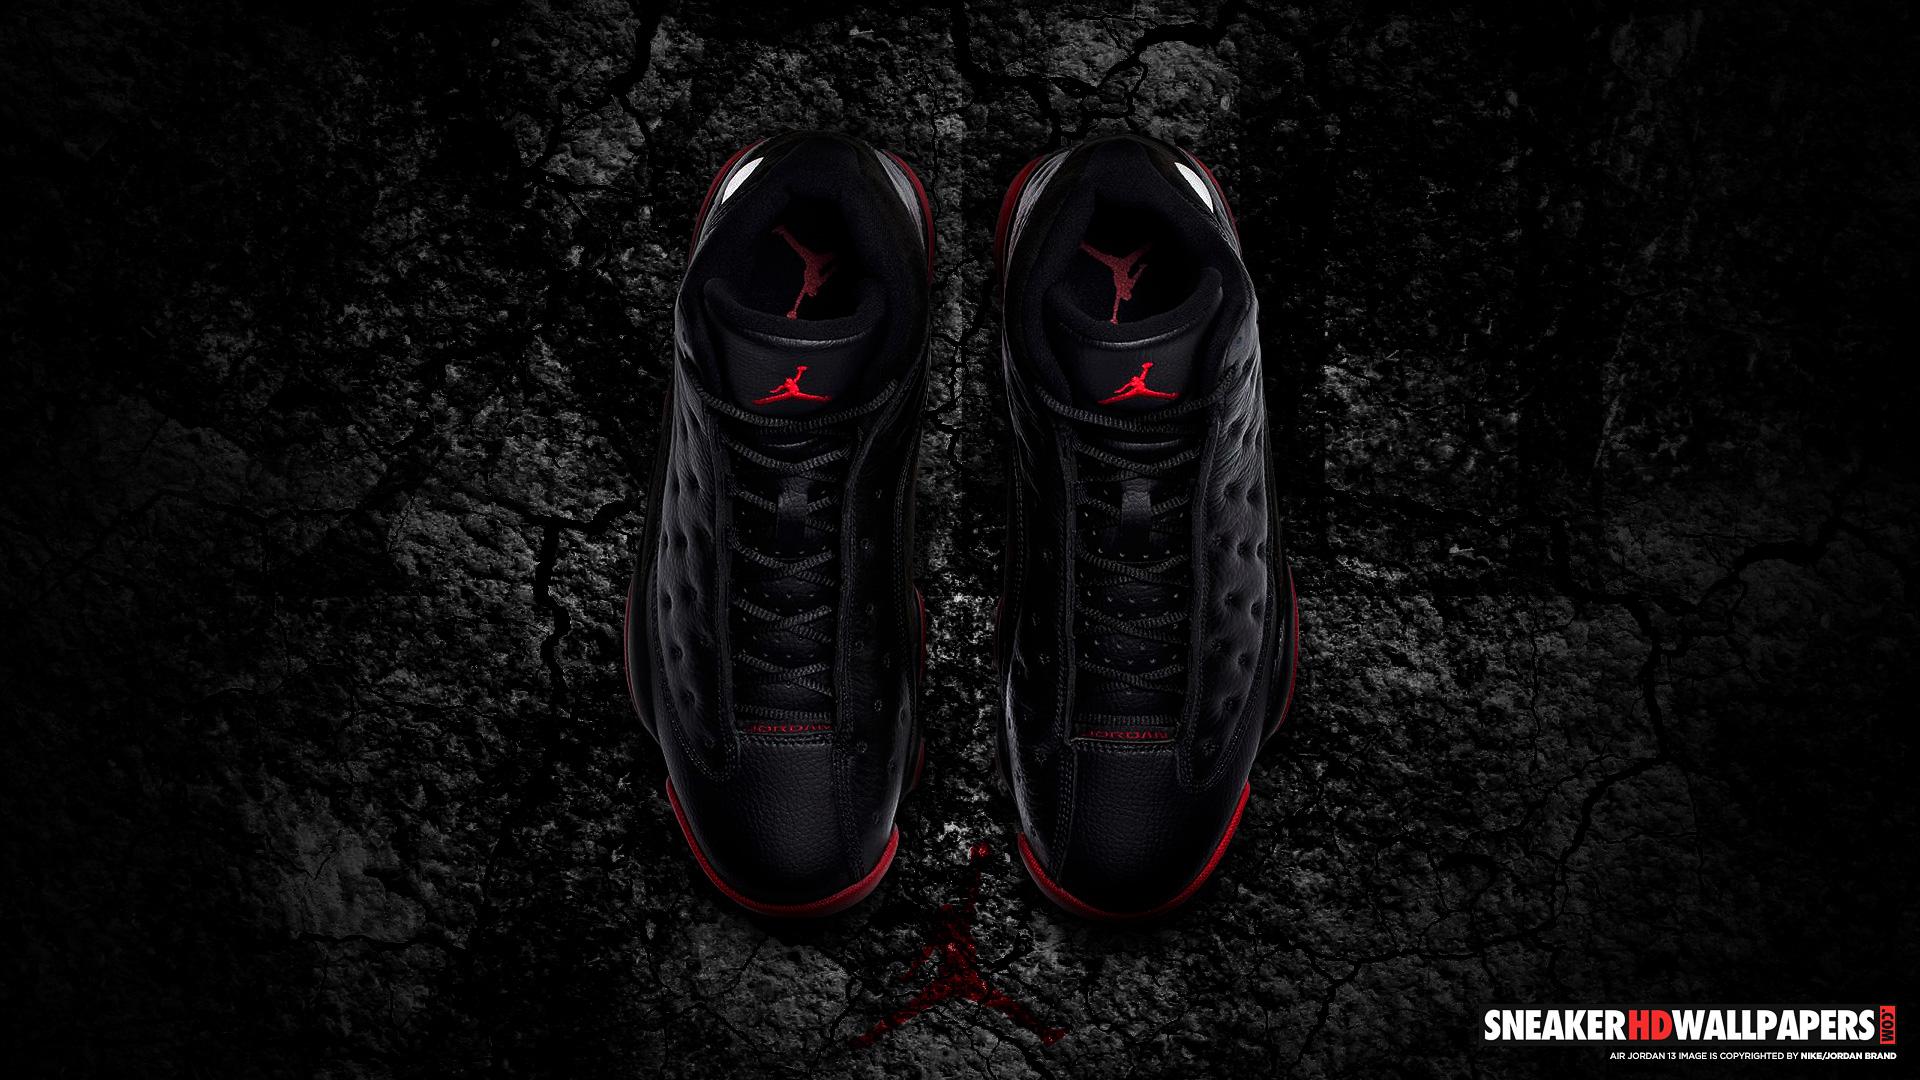 Black Background Red And Black Jordan Shoes